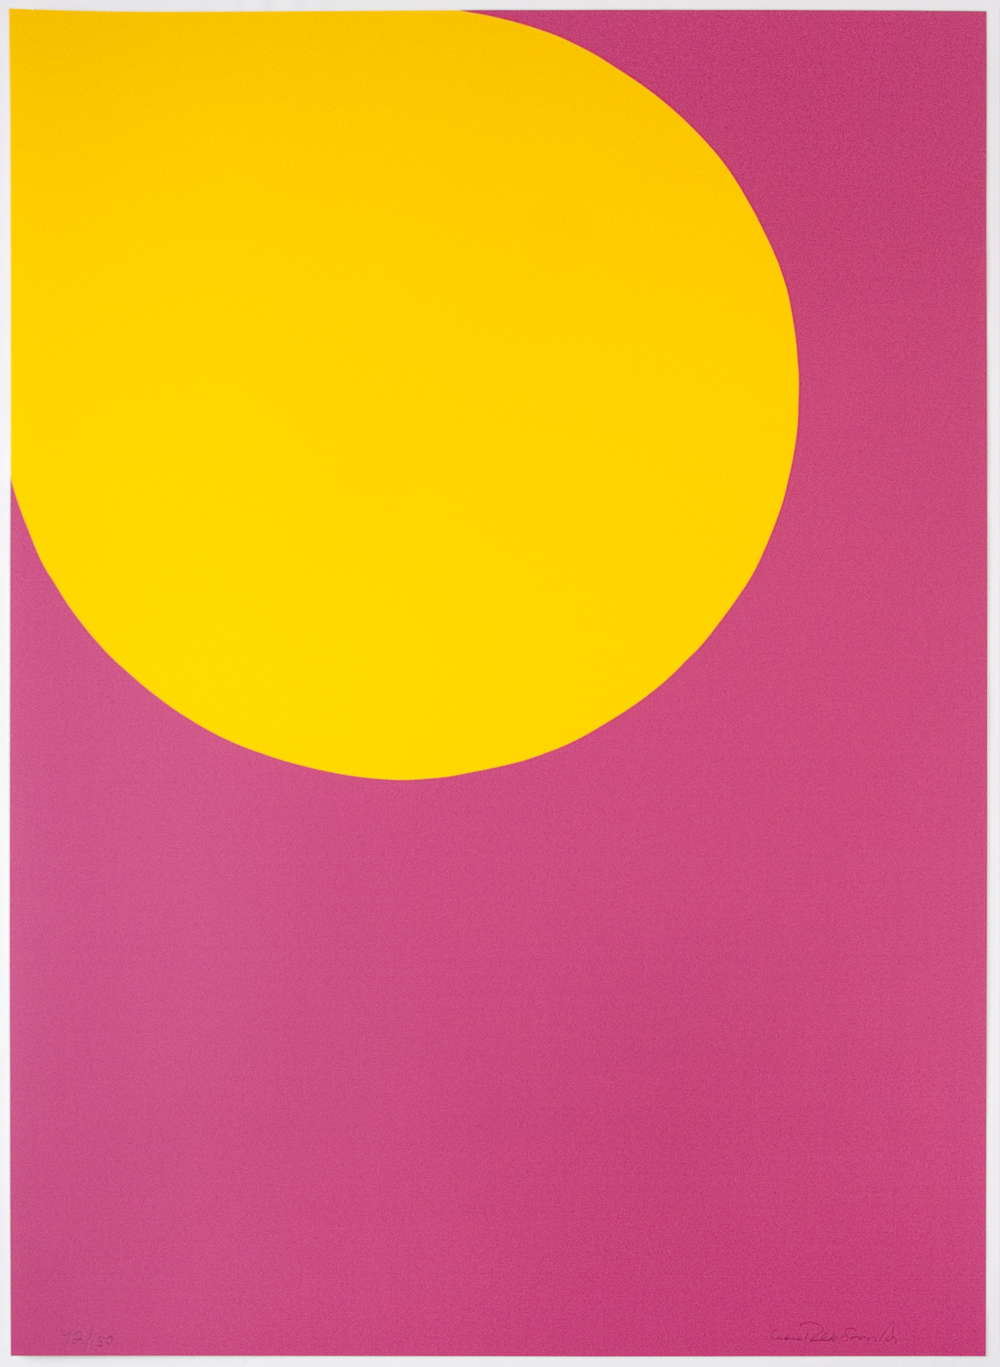 Leon Polk Smith (American, 1906-1996) Color Forms (F), 1974 Screenprint 33 x 23 1/4 inches